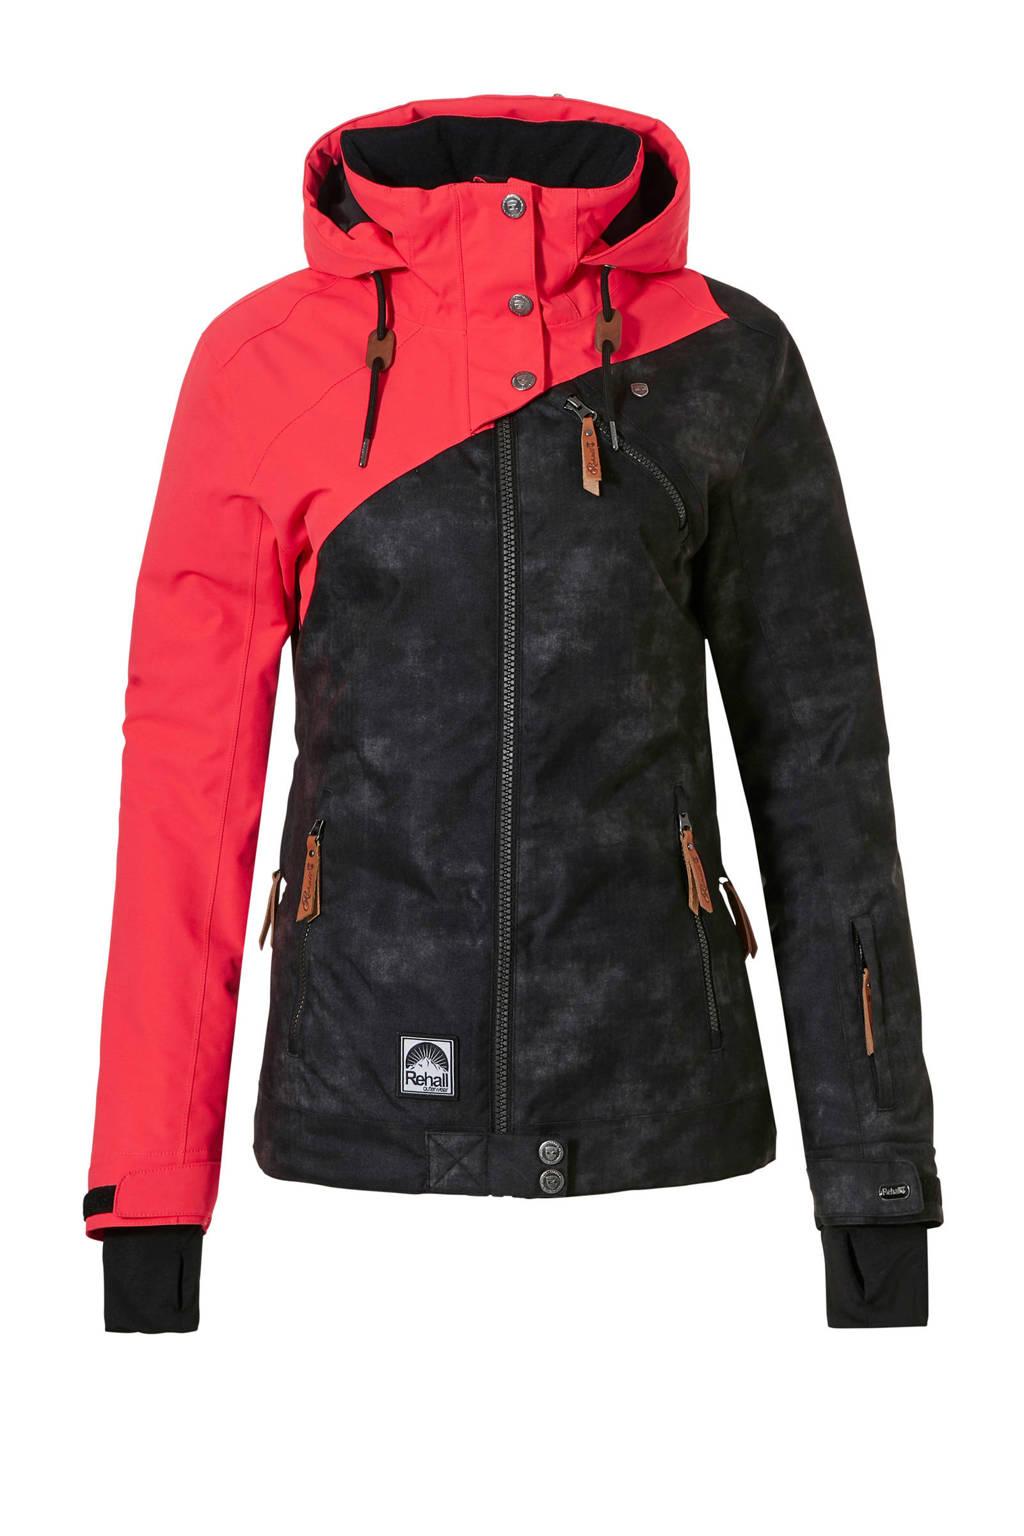 Rehall jack Josey-R donkergrijs/rood, Donkergrijs/rood